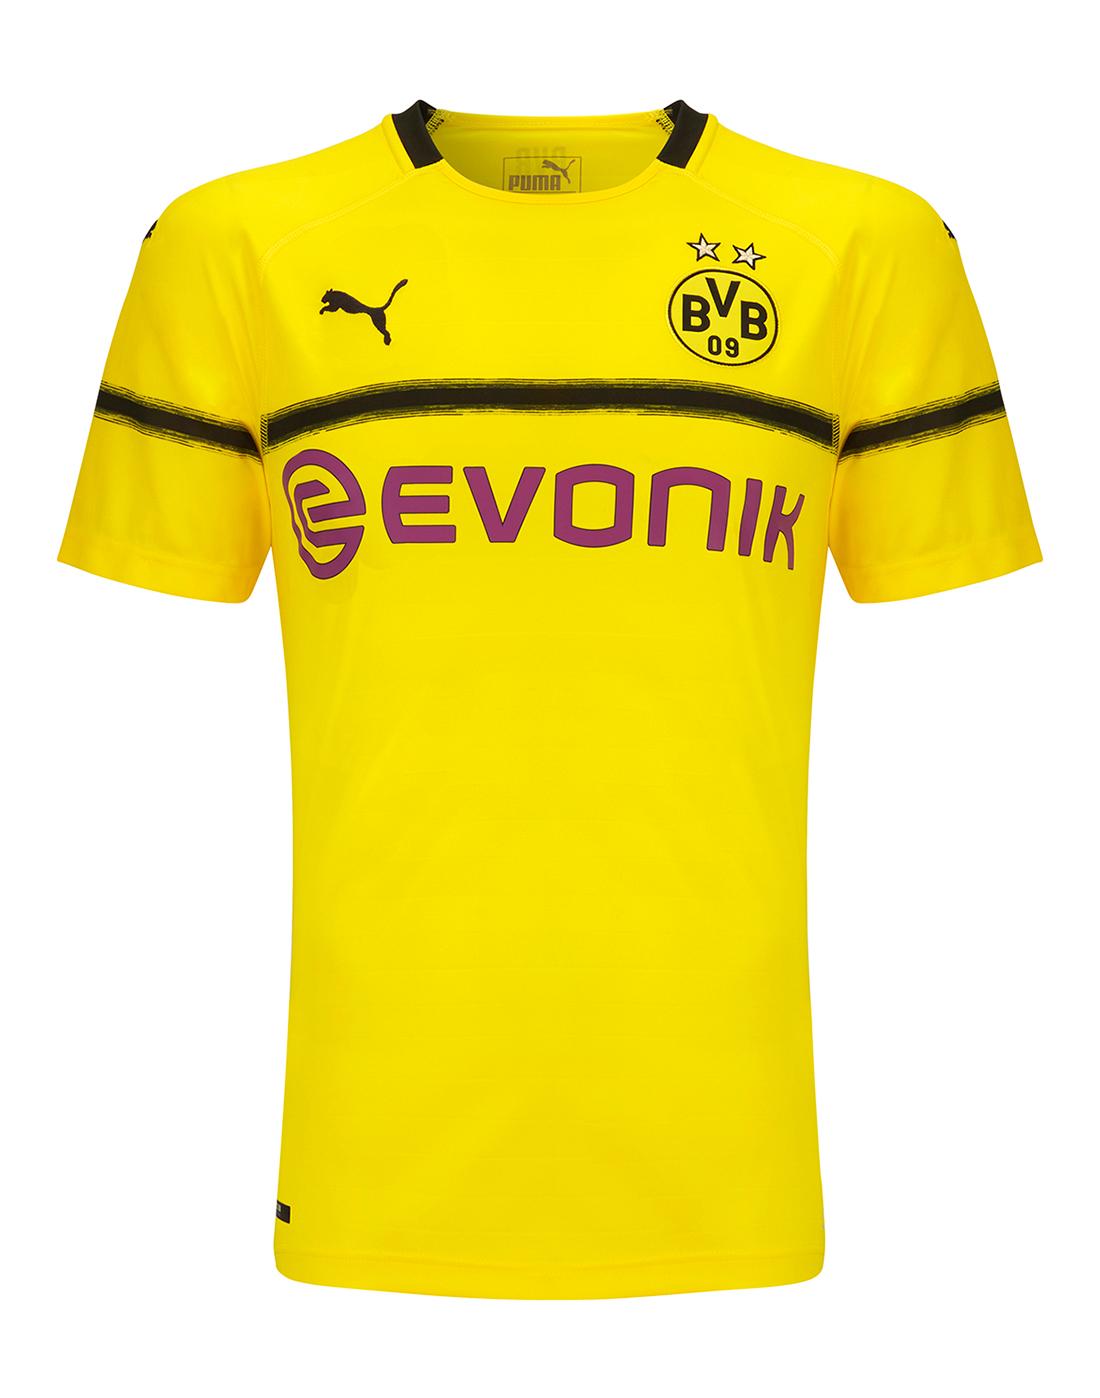 Dortmund 18/19 Third Jersey | Puma | Life Style Sports